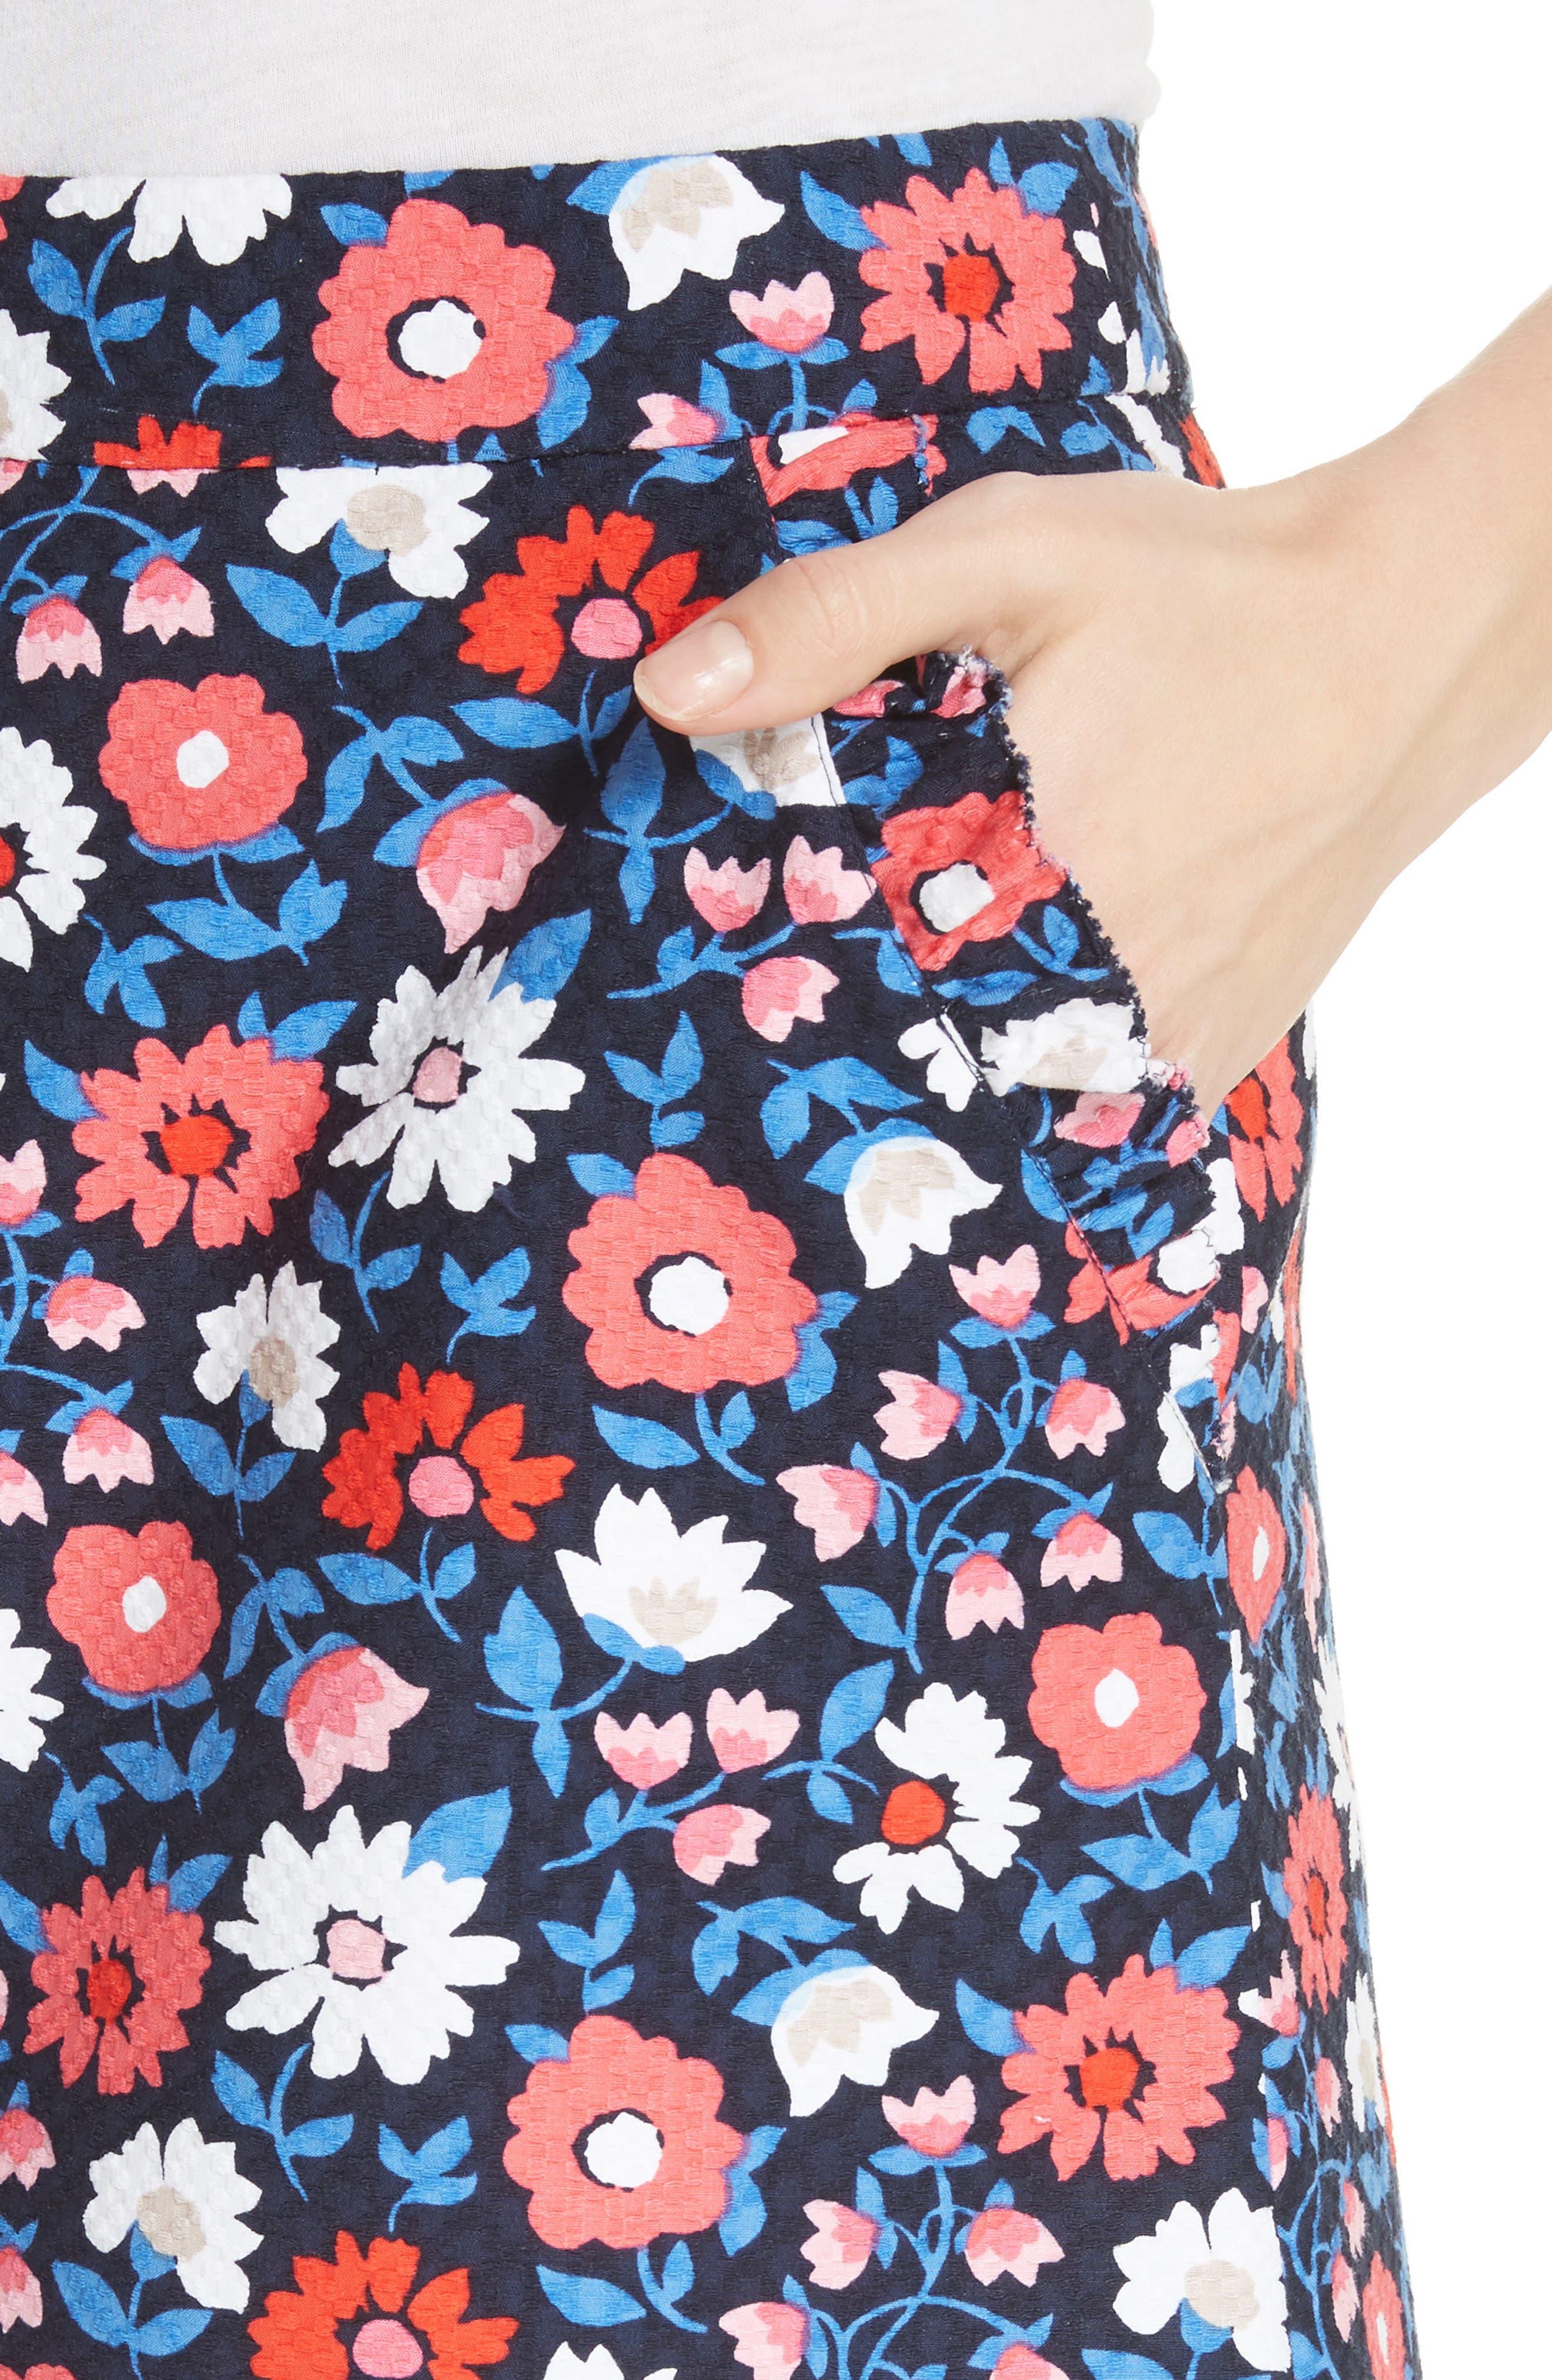 daisy jacquard A-line skirt,                             Alternate thumbnail 4, color,                             473